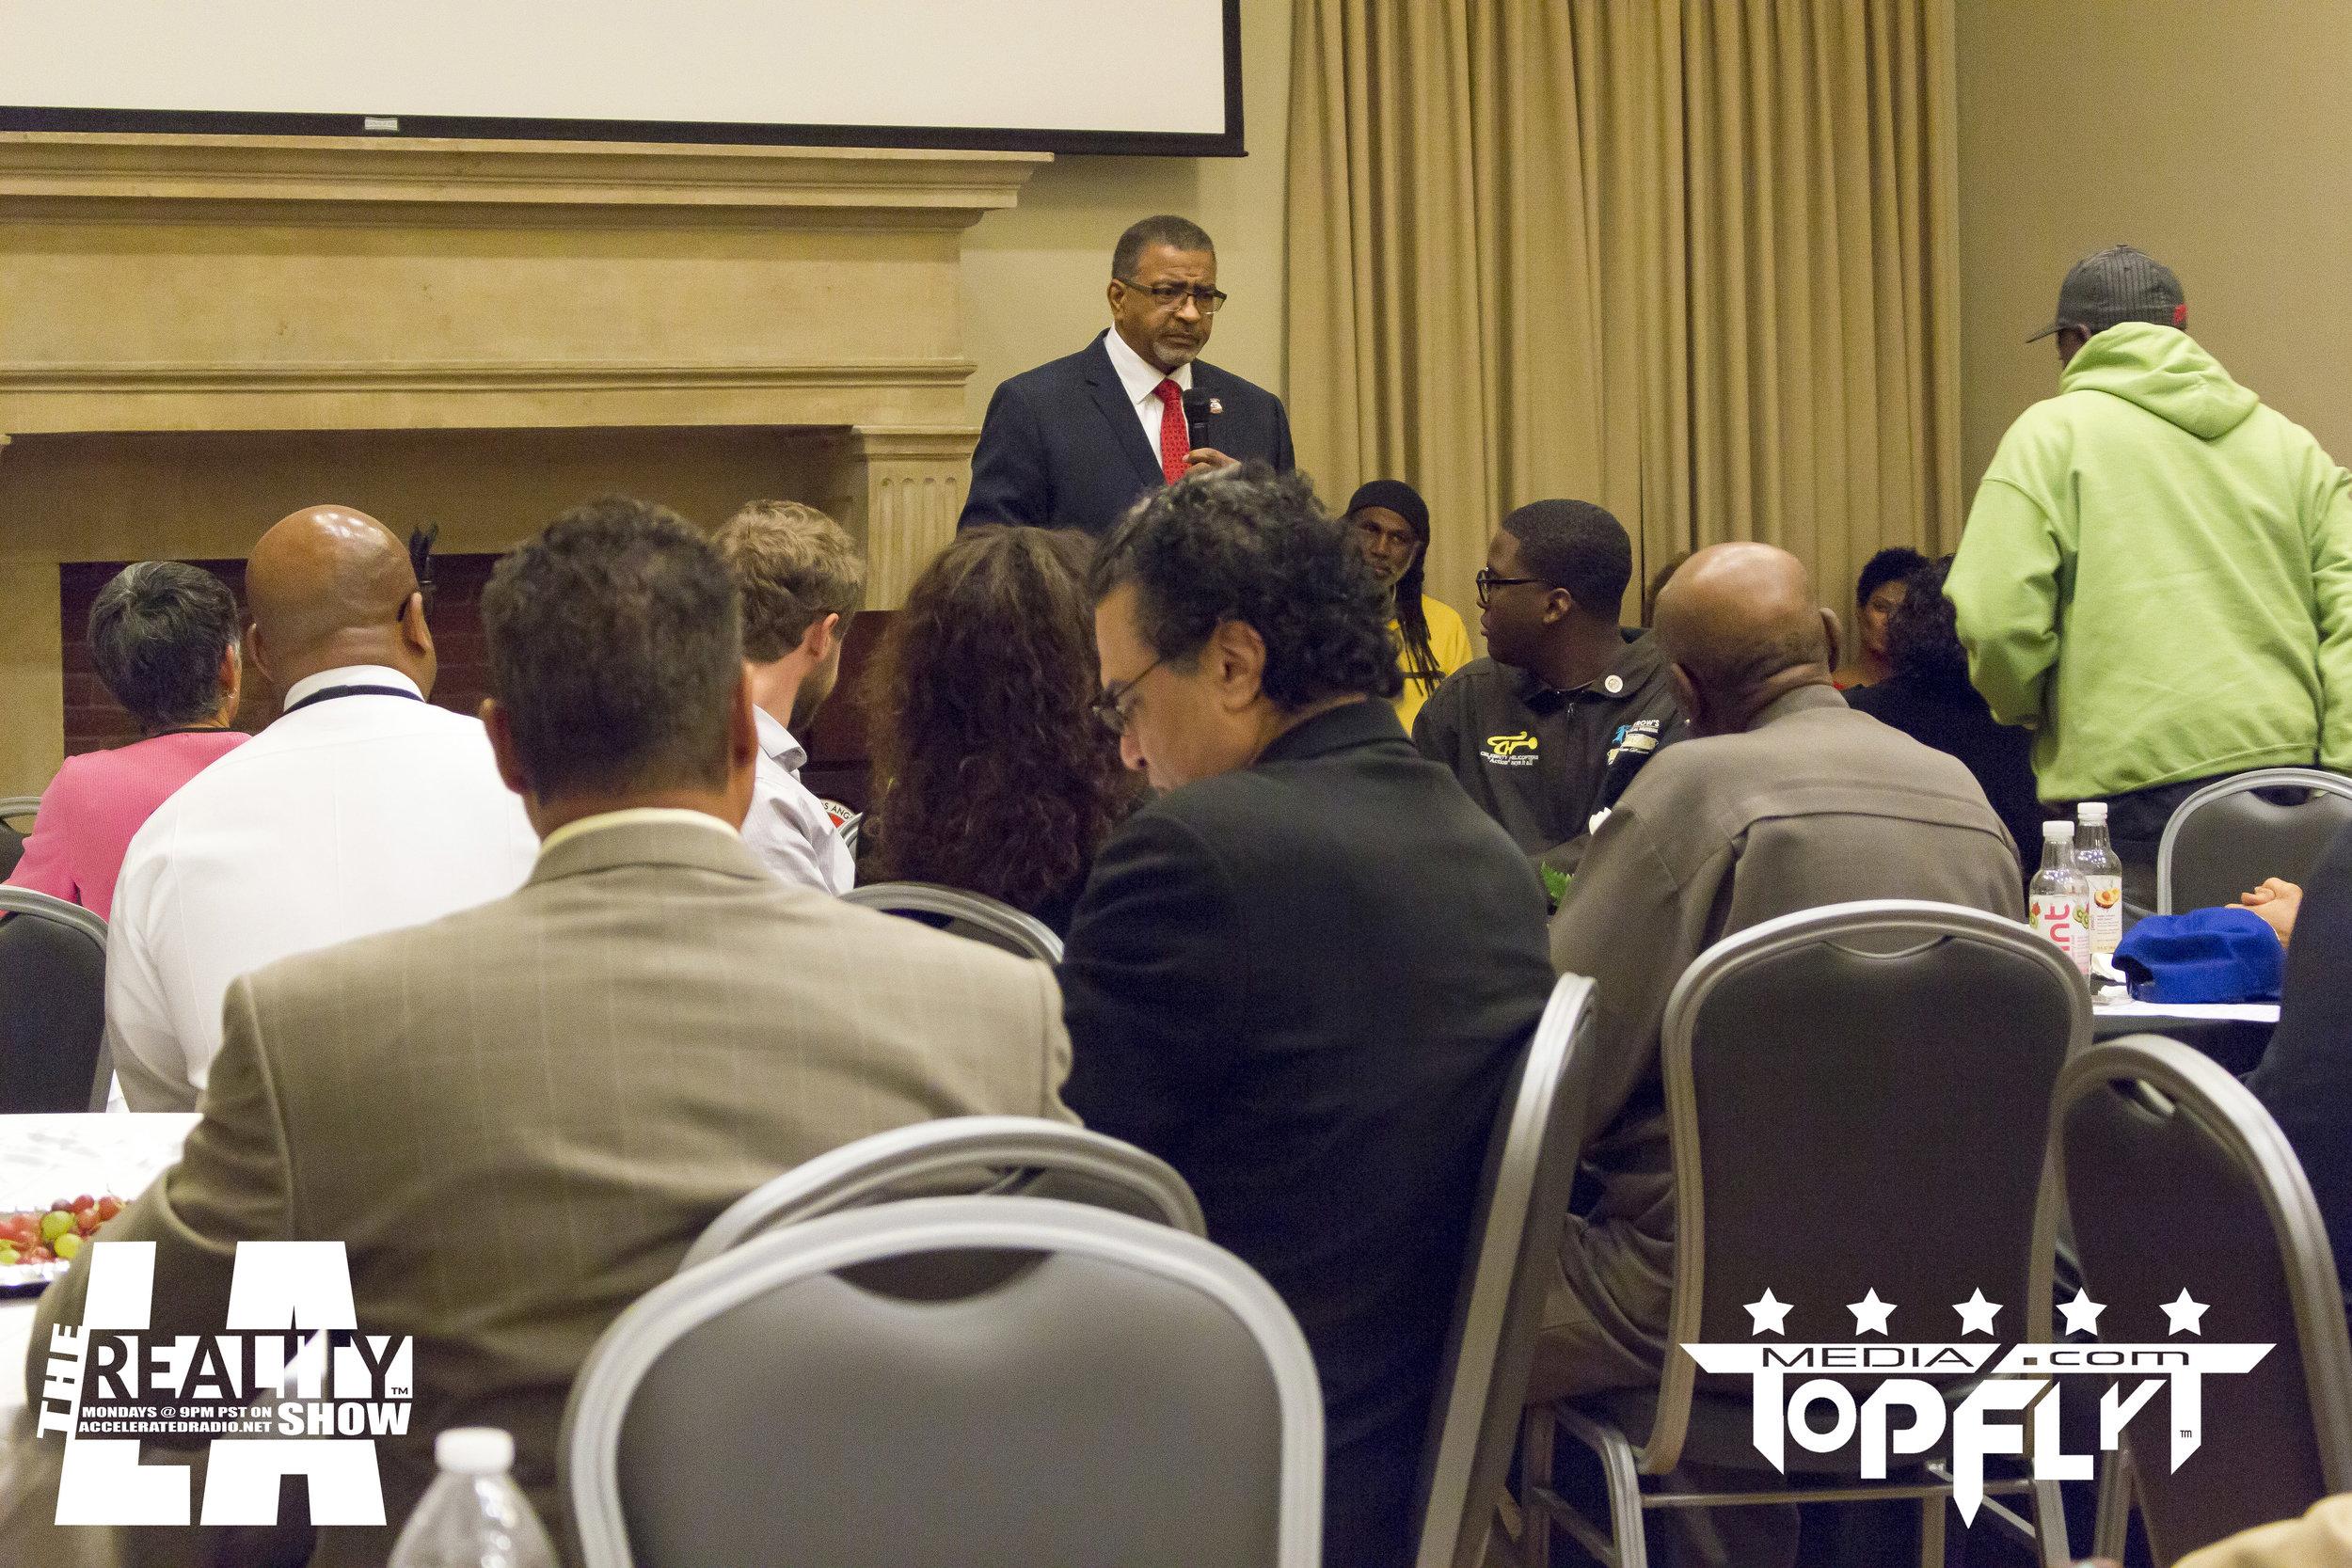 The Reality Show LA - Tuskegee Airmen 75th Anniversary VIP Reception_79.jpg